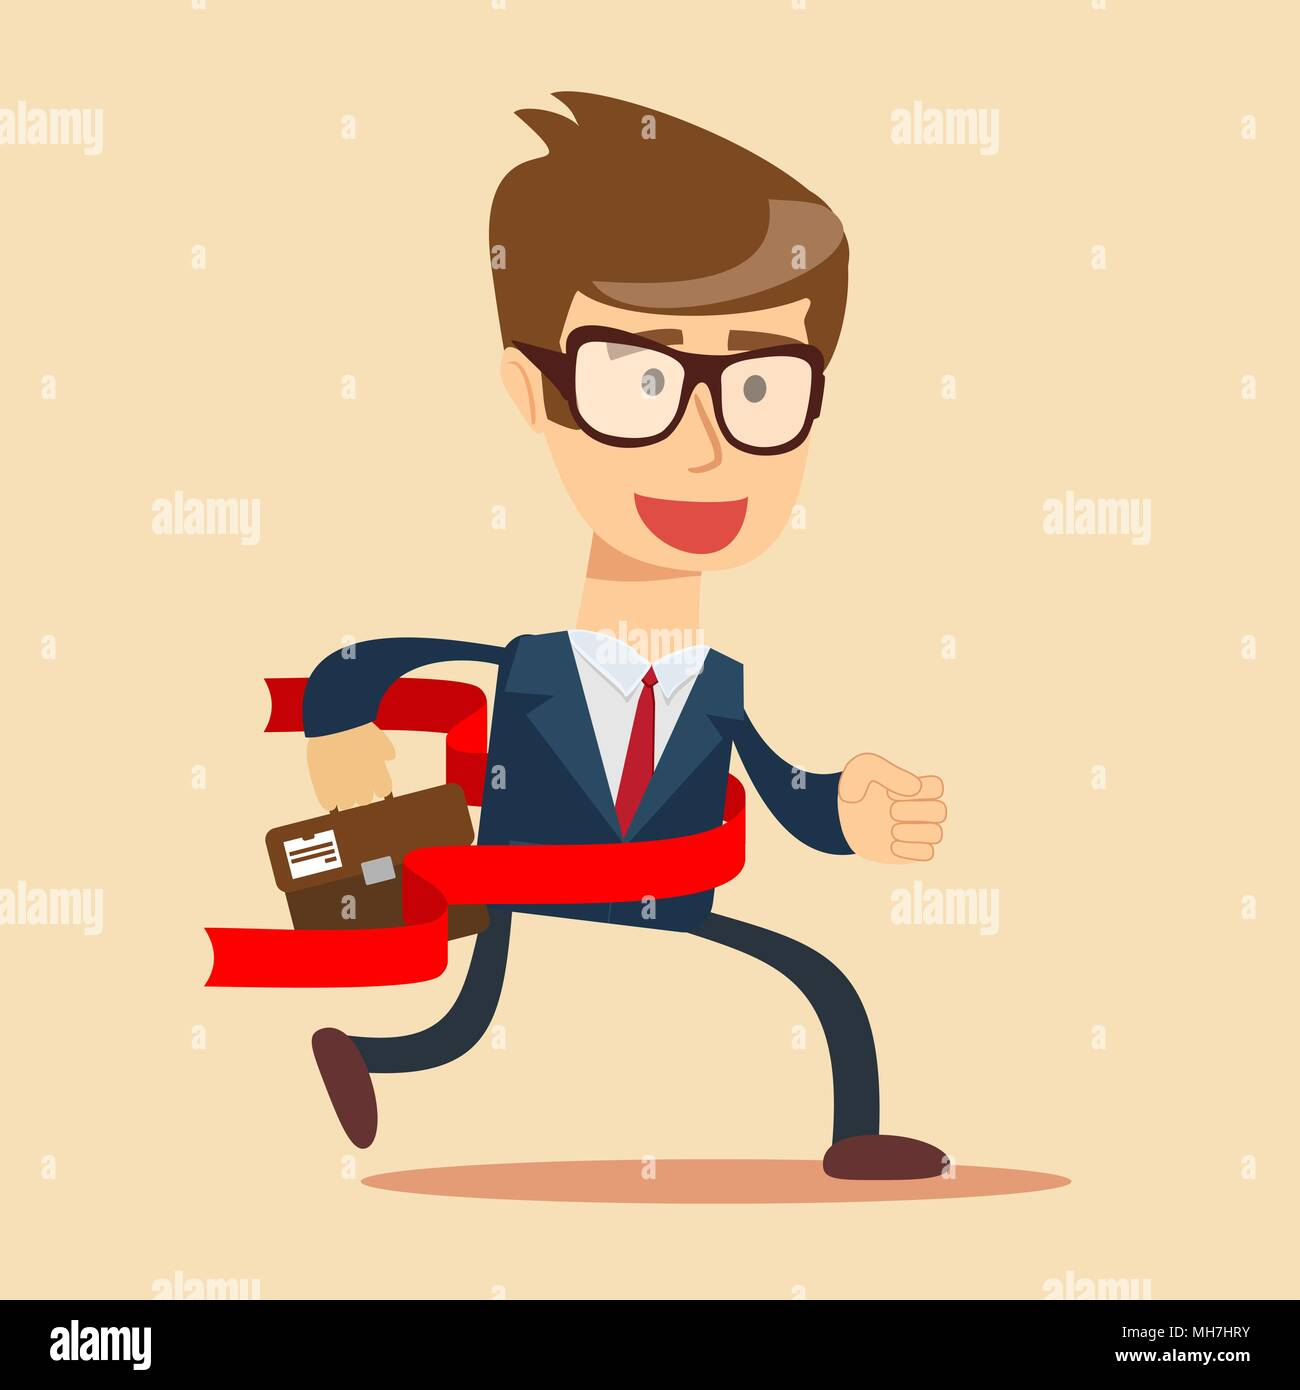 Nozione di imprenditore di successo in una linea di finitura. Immagini Stock